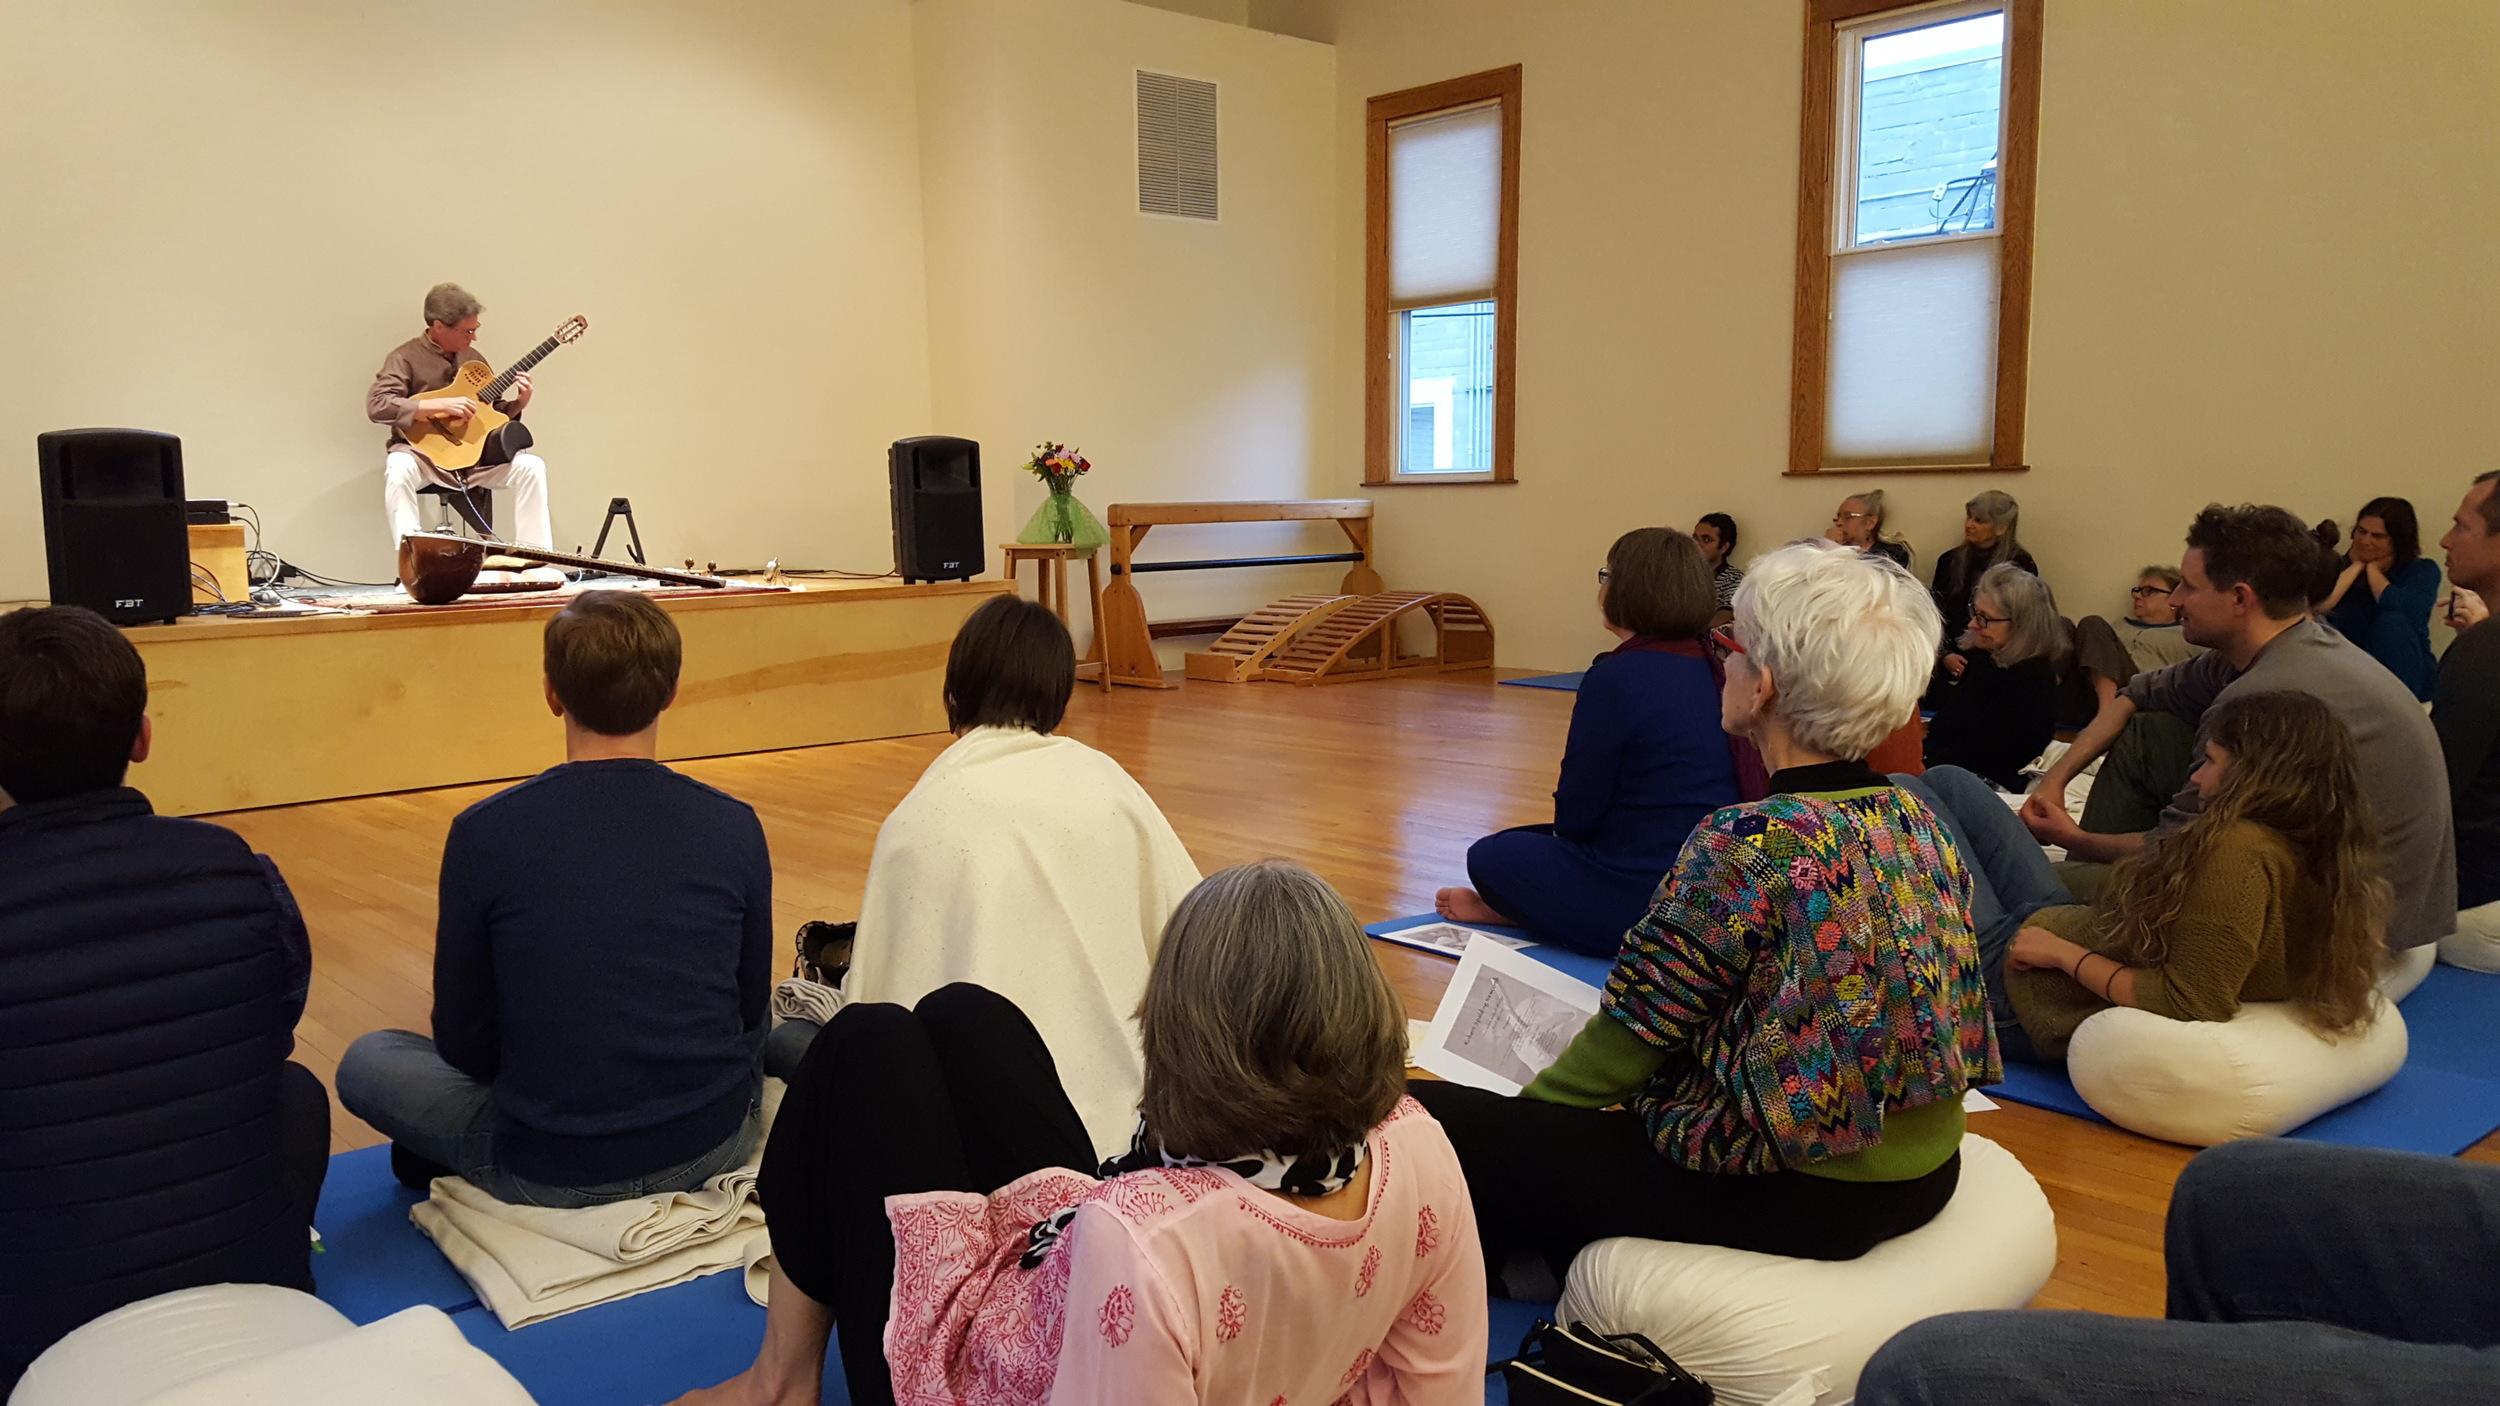 Ann Arbor School of Yoga - April 30, 2016